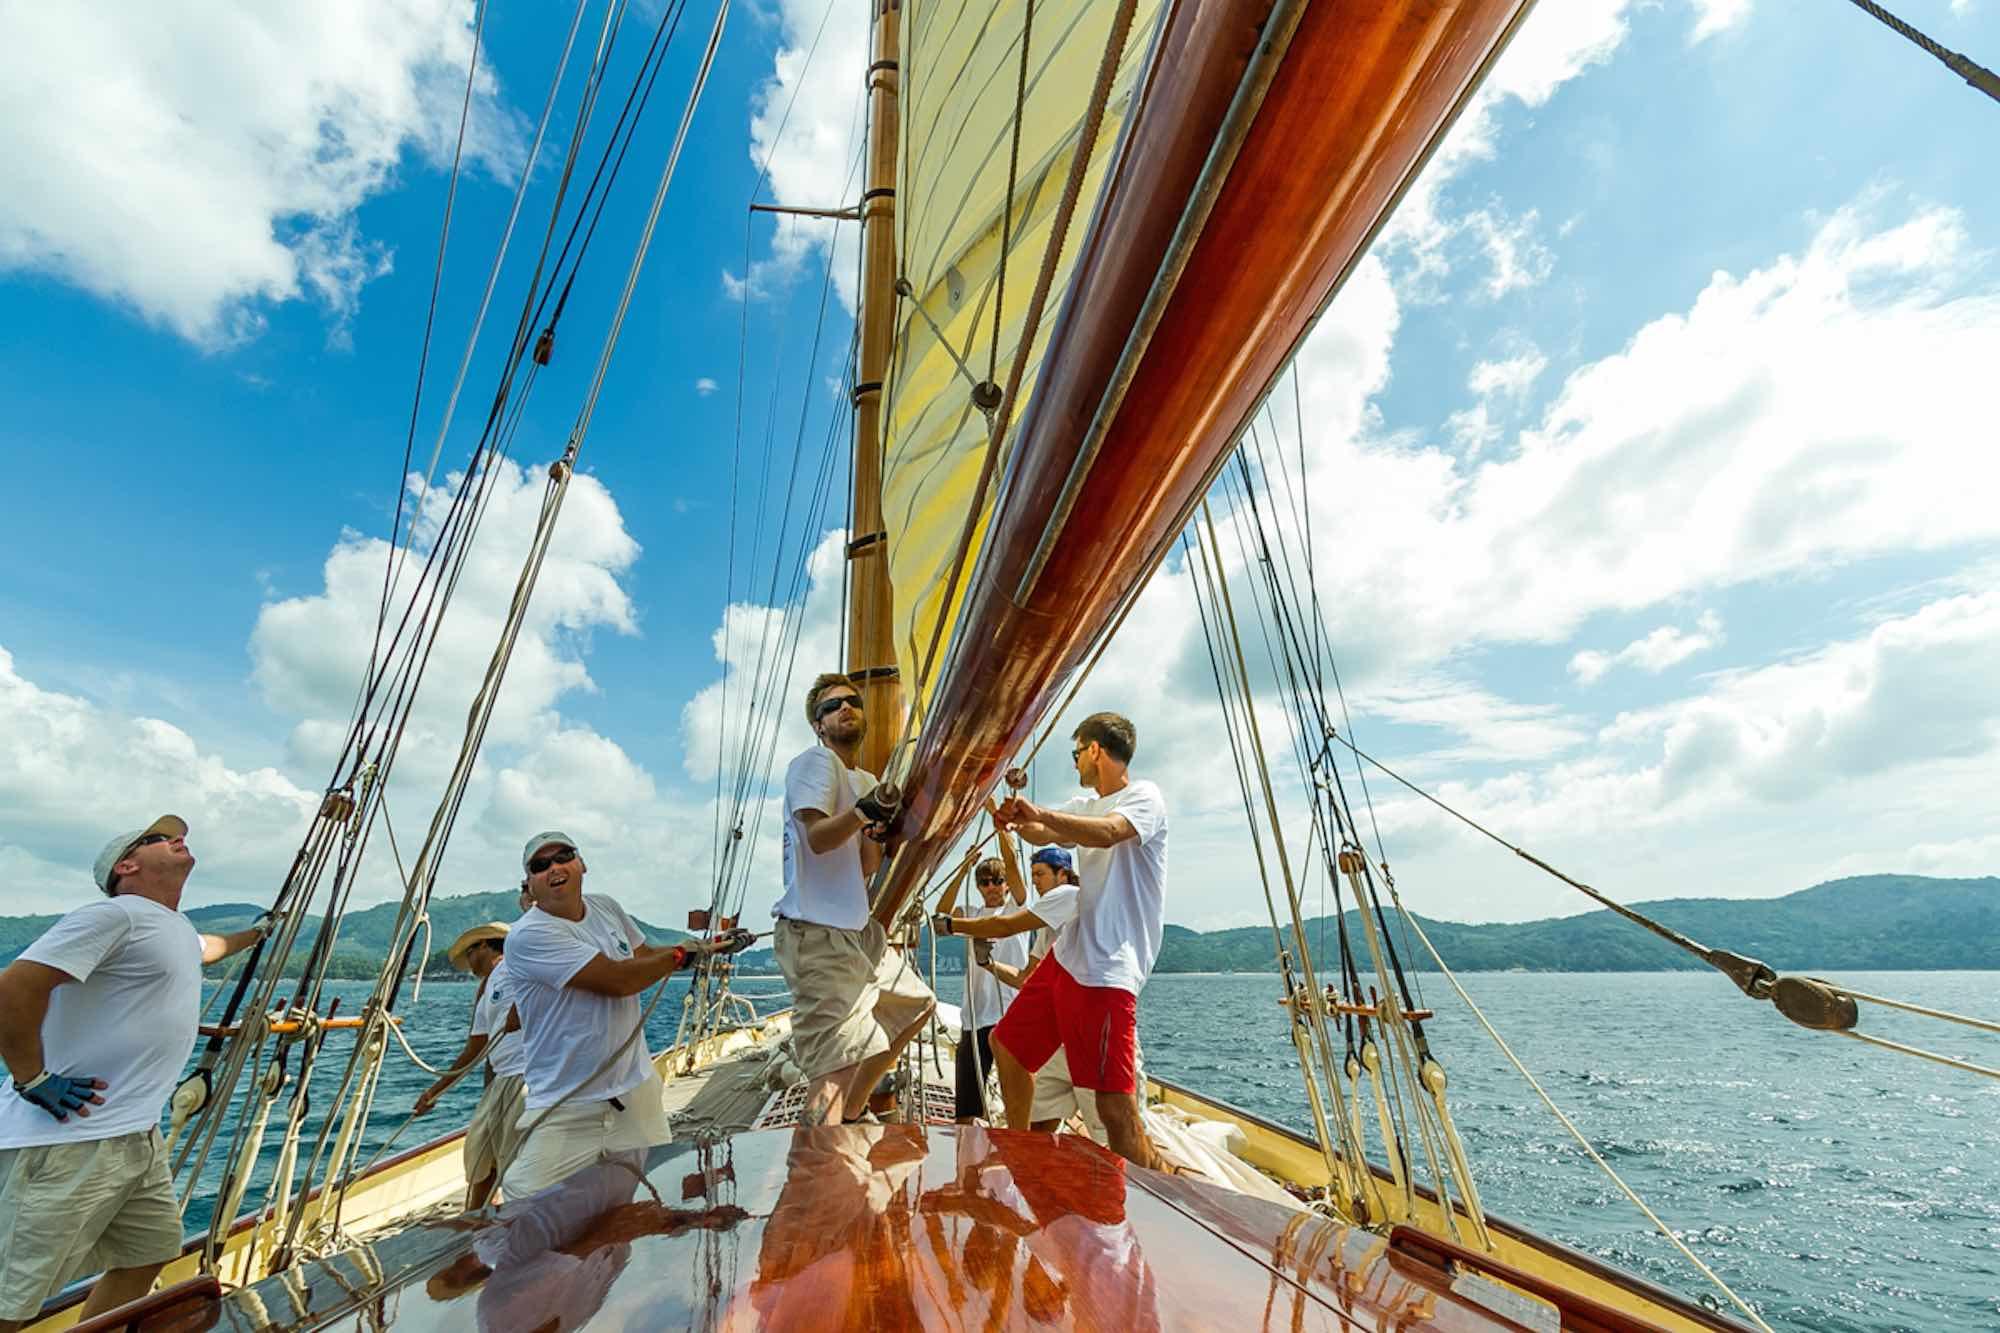 asia superyacht rendezvous 2014 sunshine (3).jpeg